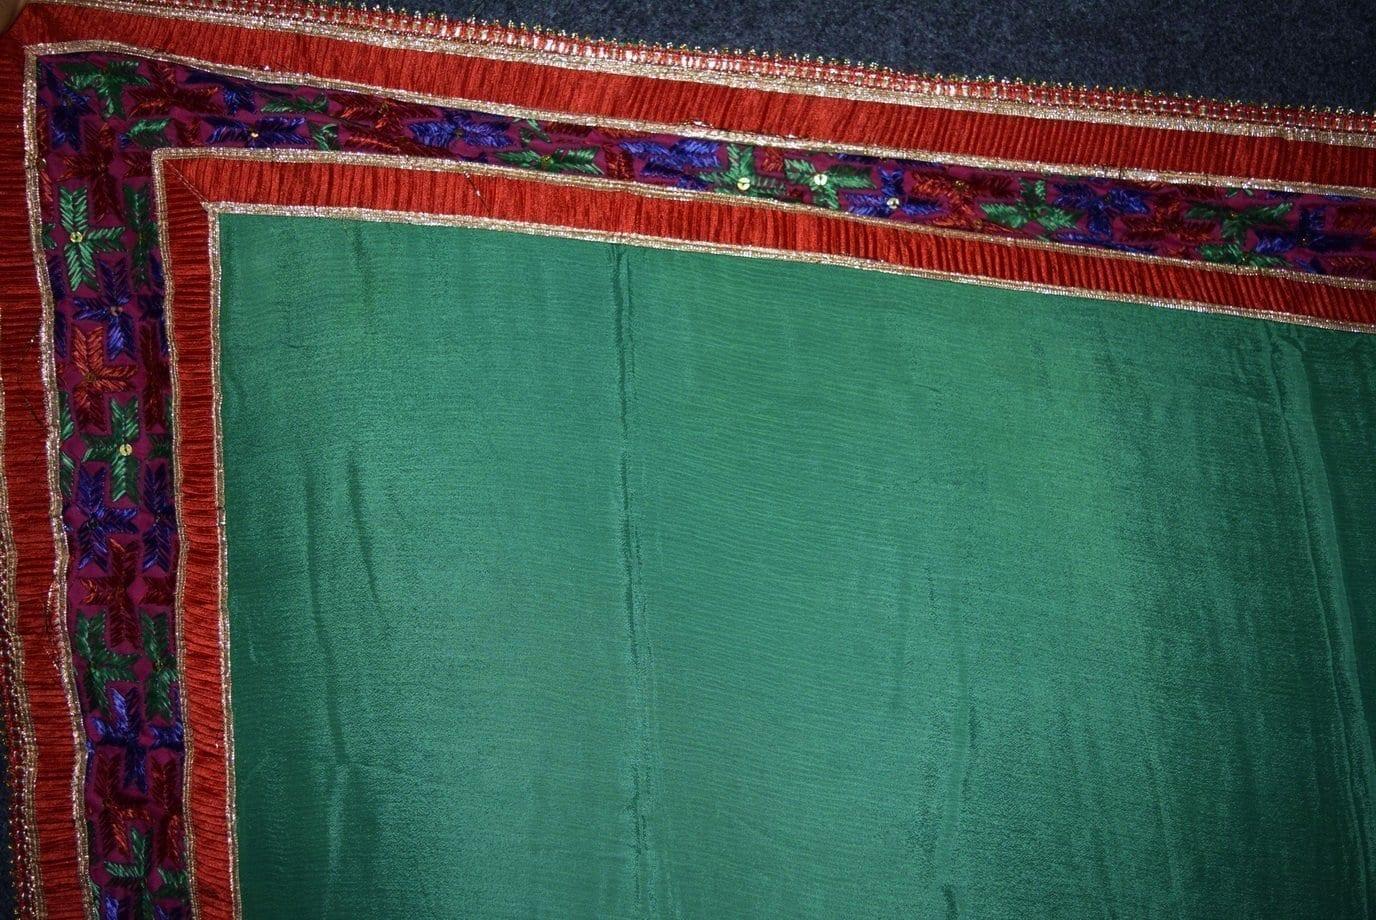 Glazed Cotton Hand Embroidered Salwar kameez suit CHINON DUPATTA set F0661 3